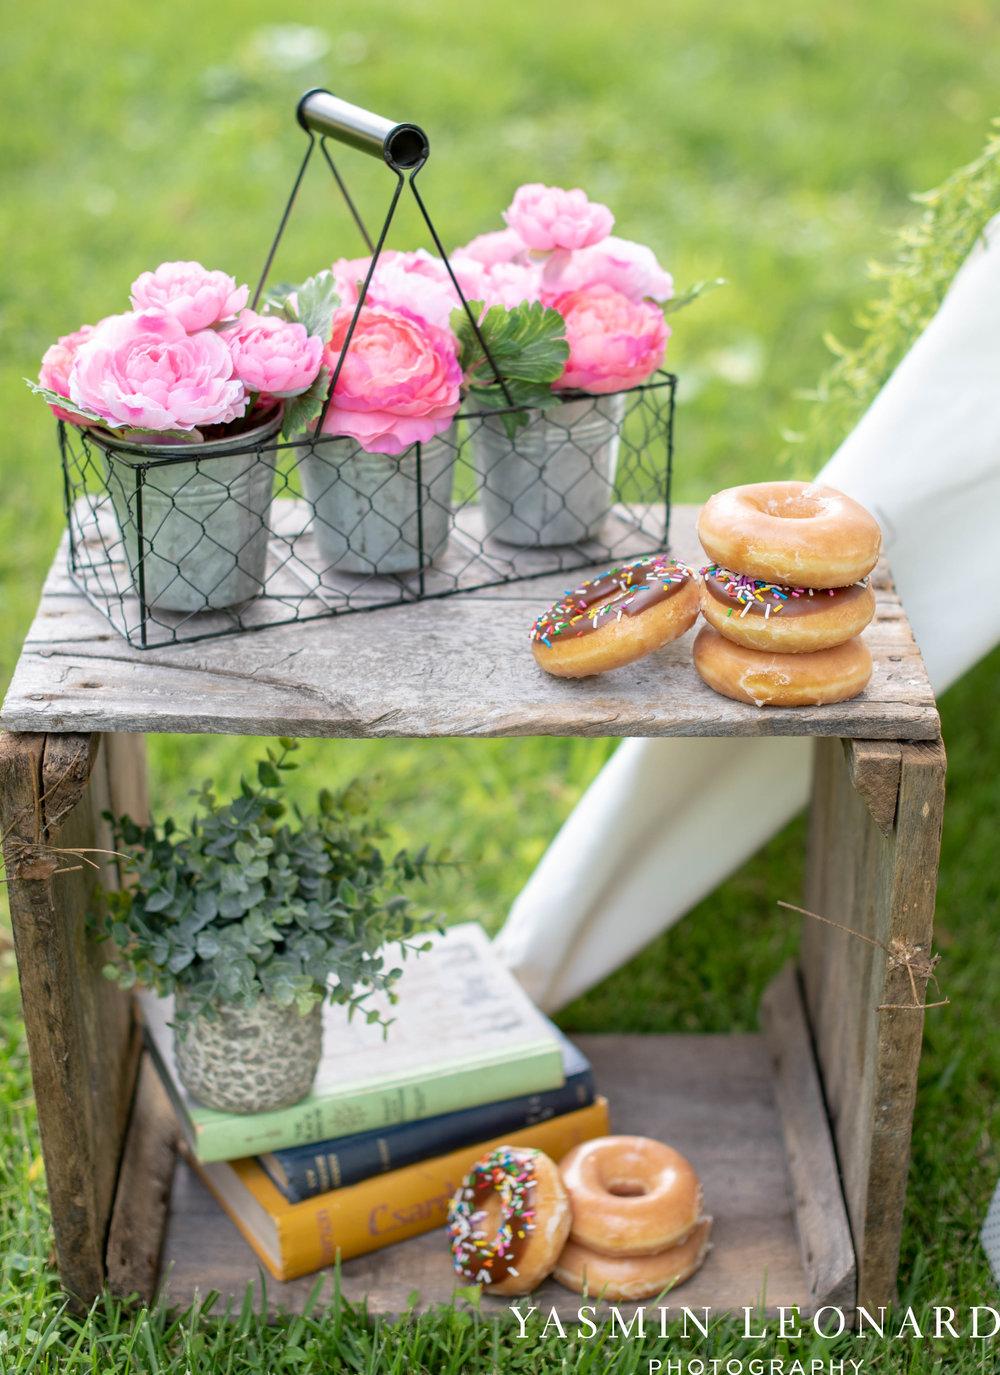 Twins First Birthay - Donut Birthday Session - Doughnuts Birthday Session - Cake Smash Ideas - TeePee Birthday Ideas - Yasmin Leonard Photography-3.jpg